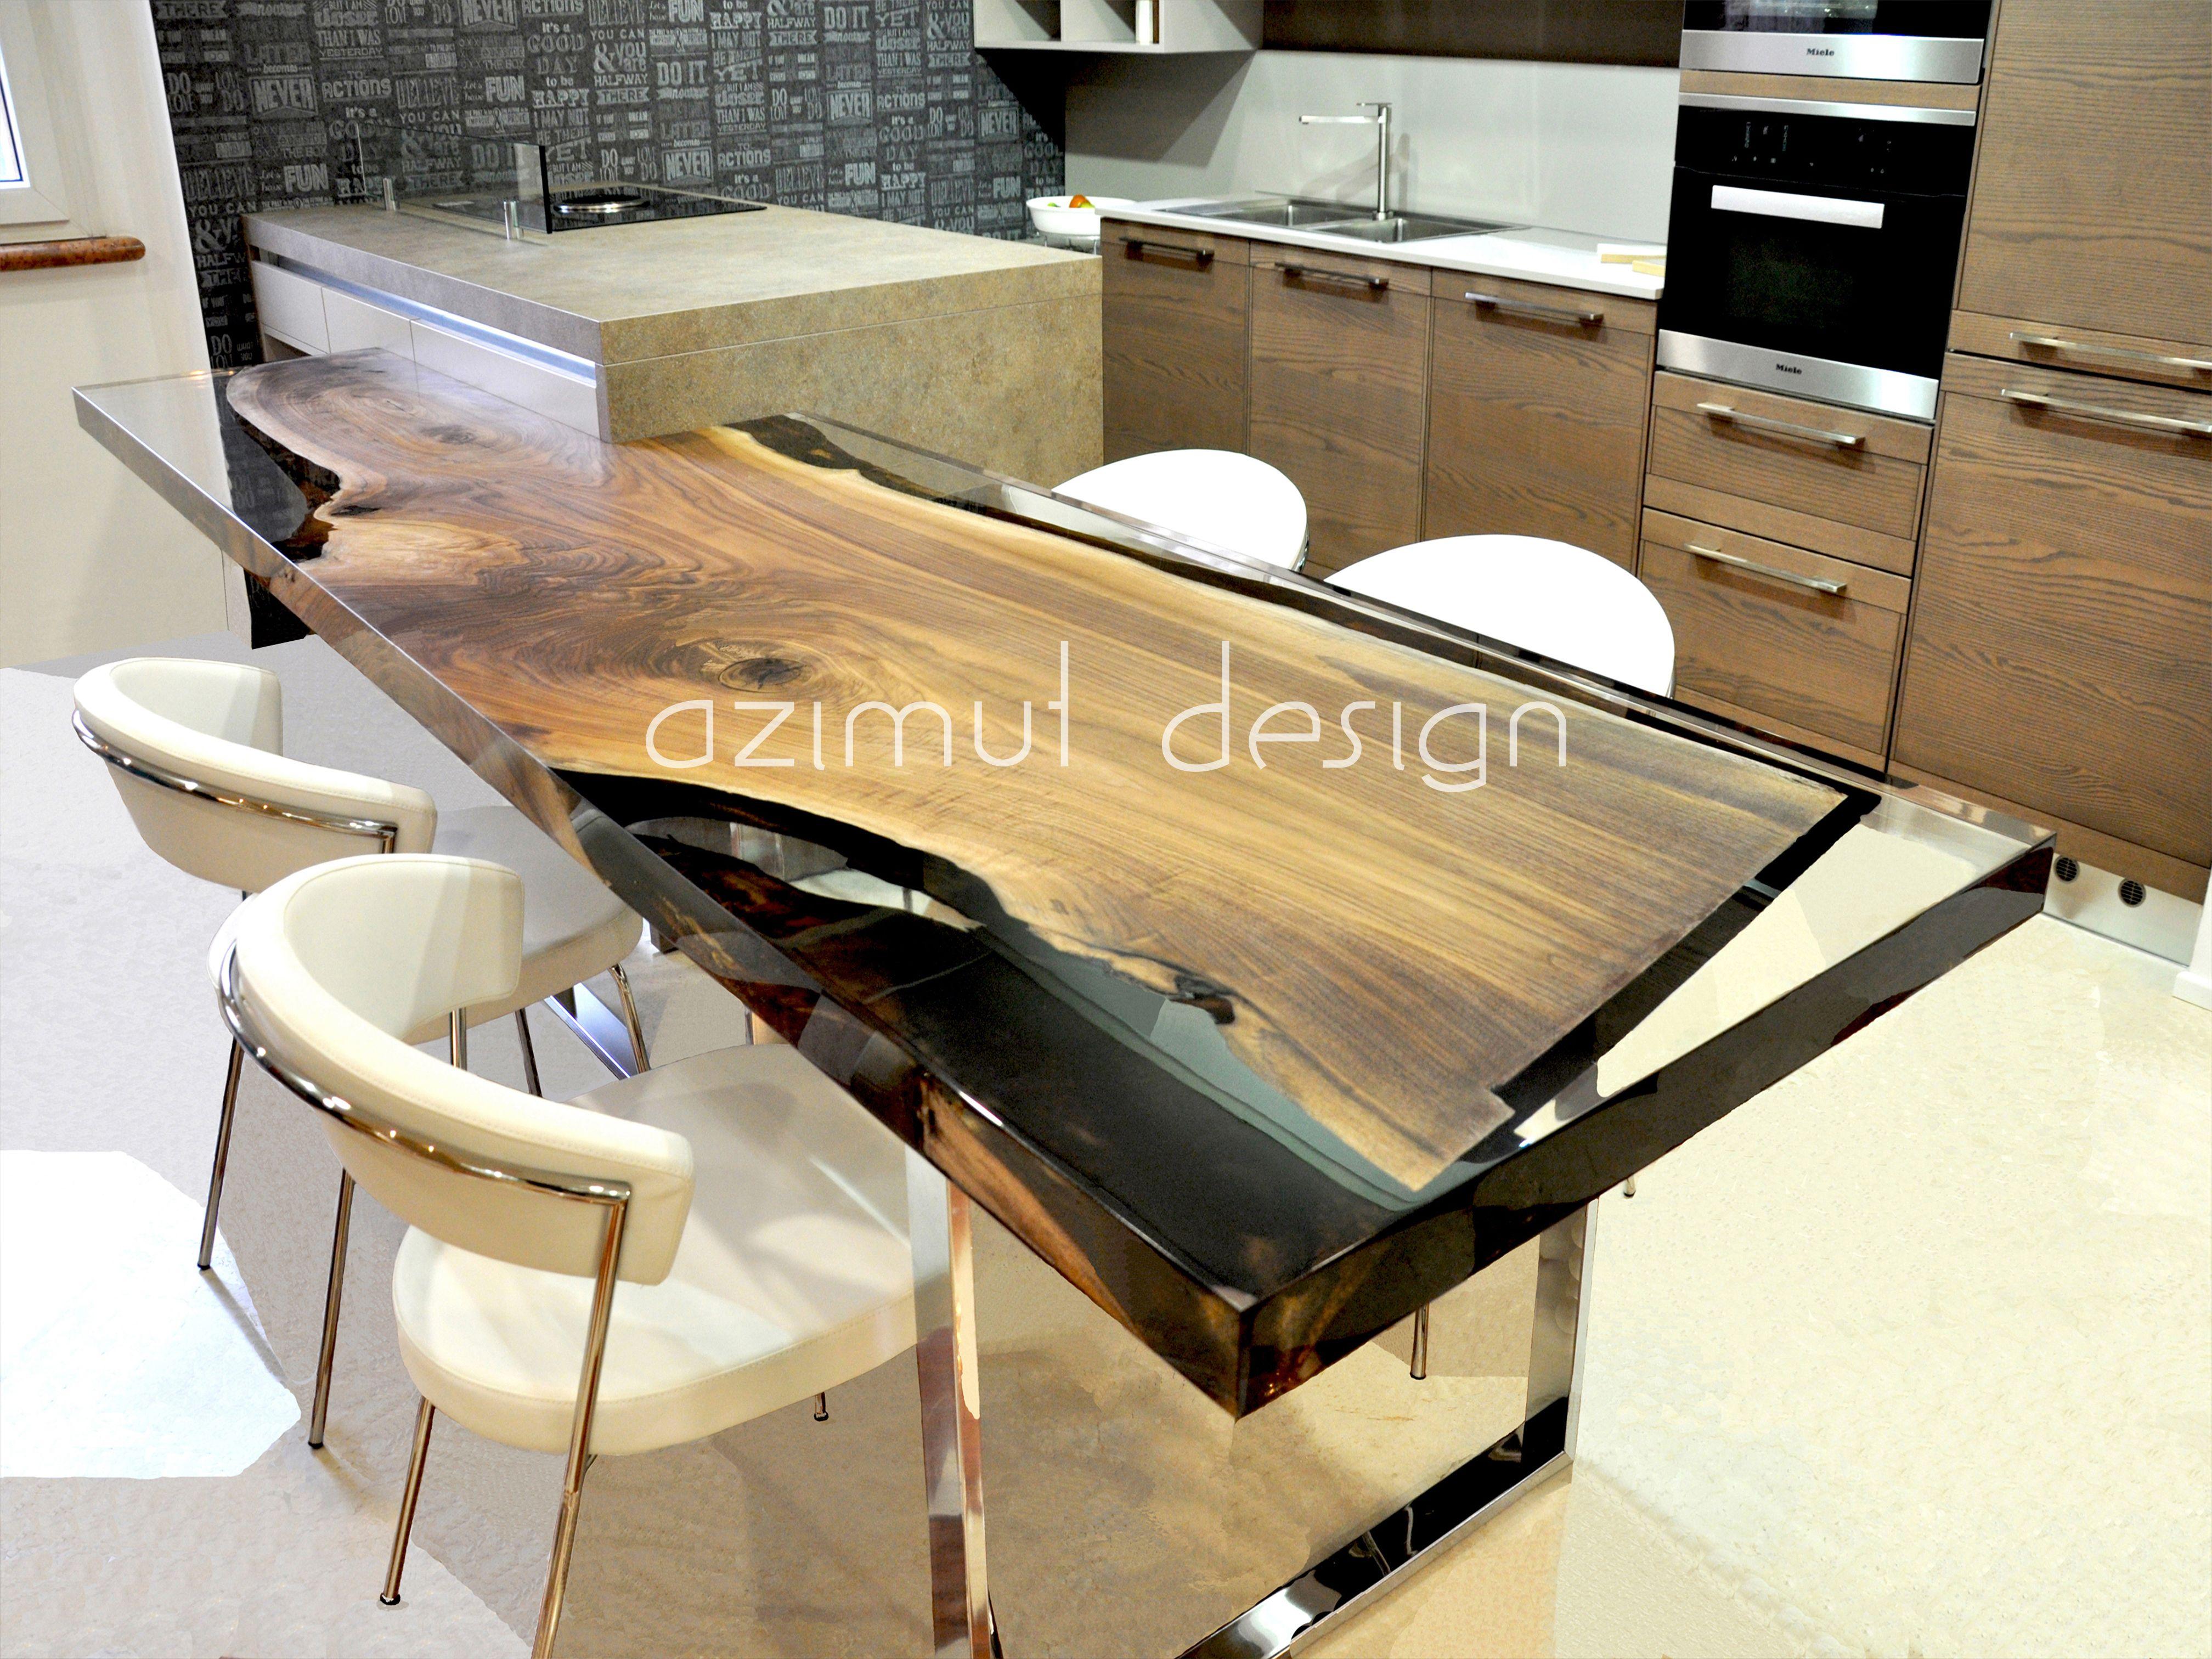 Mobili In Legno Massiccio Trentino design elements for interiors: custom solutions | design